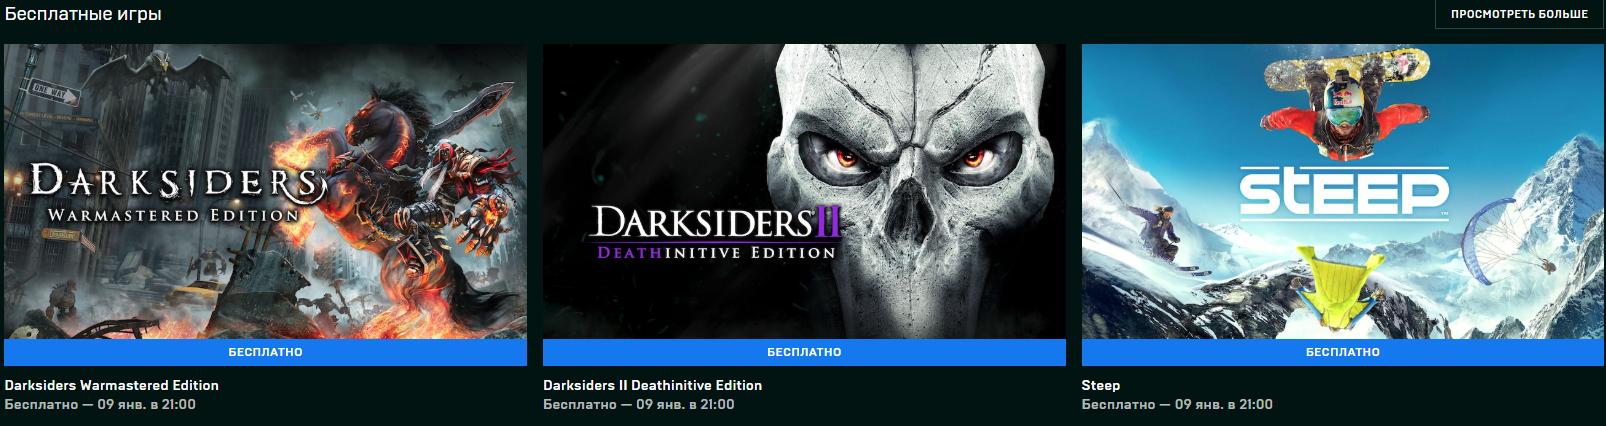 В Epic Games Store началась бесплатная раздача Darksiders, Darksiders 2 и Steep